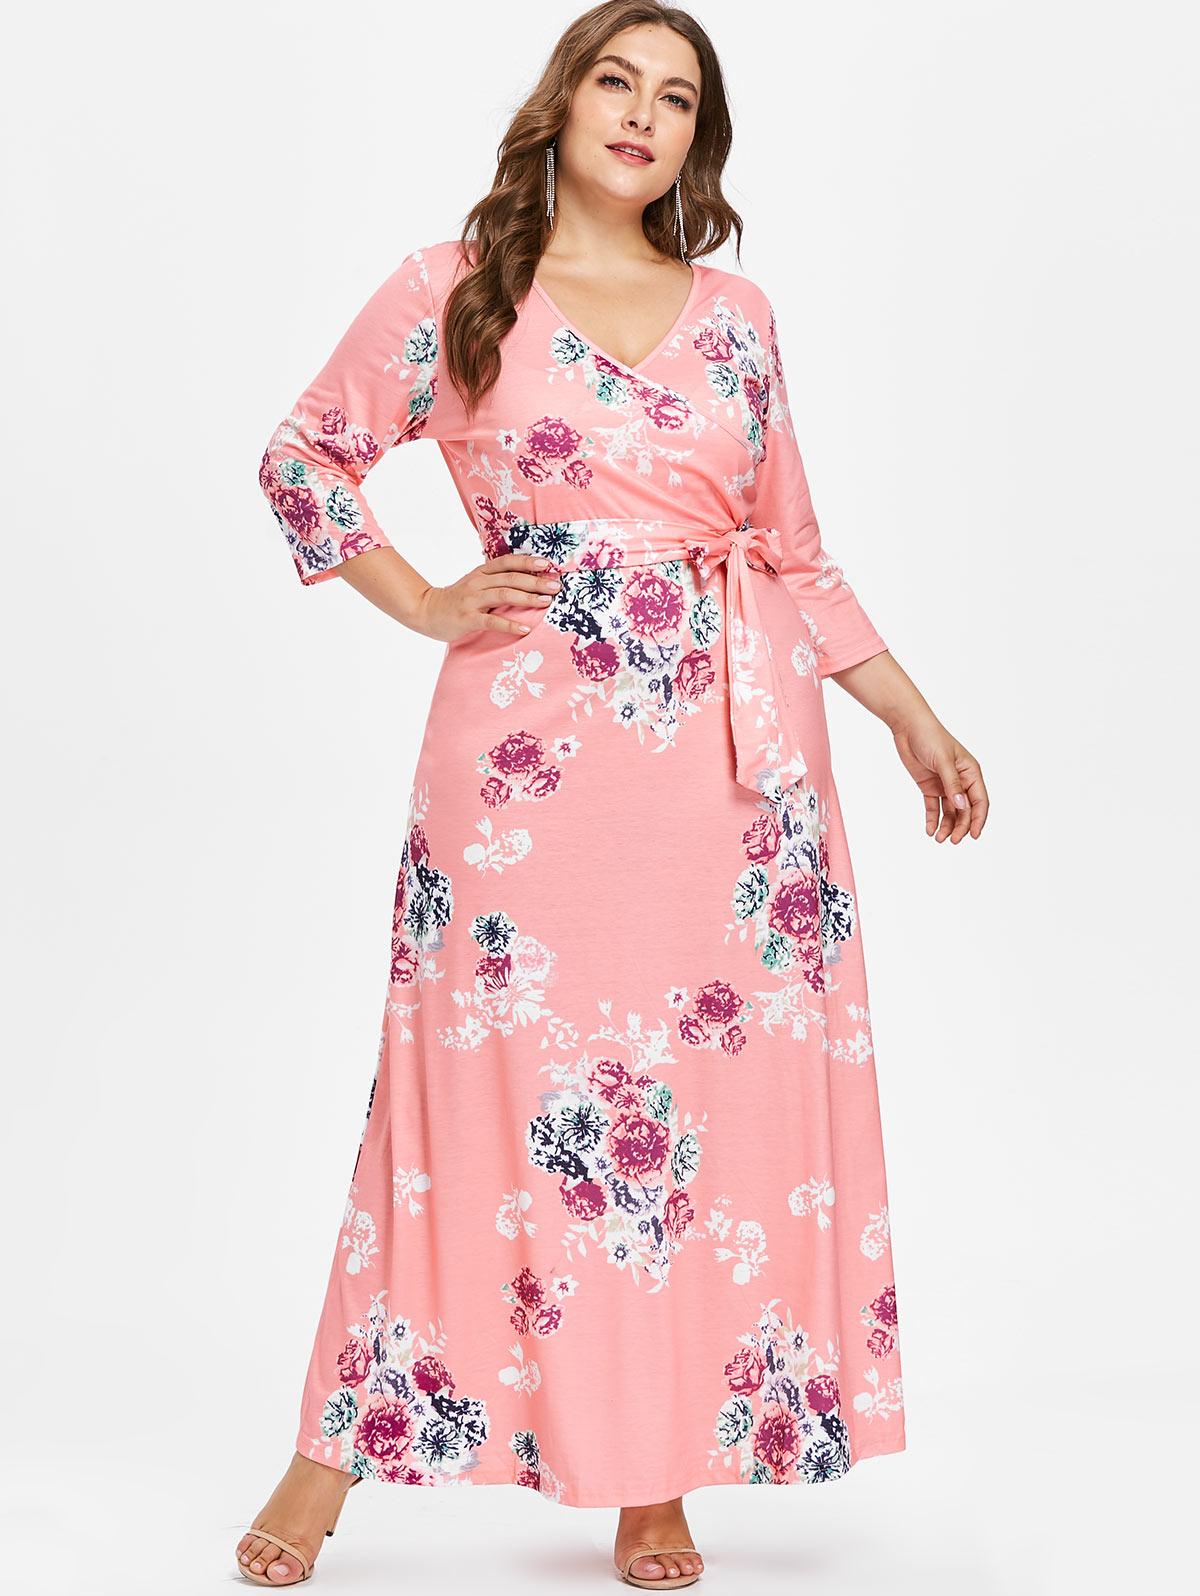 Wipalo 2019 Autumn Casual Women Plus Size Floral Print Floor Length Dress V Neck Maxi Dress With Belt A-Line Female Vestidos